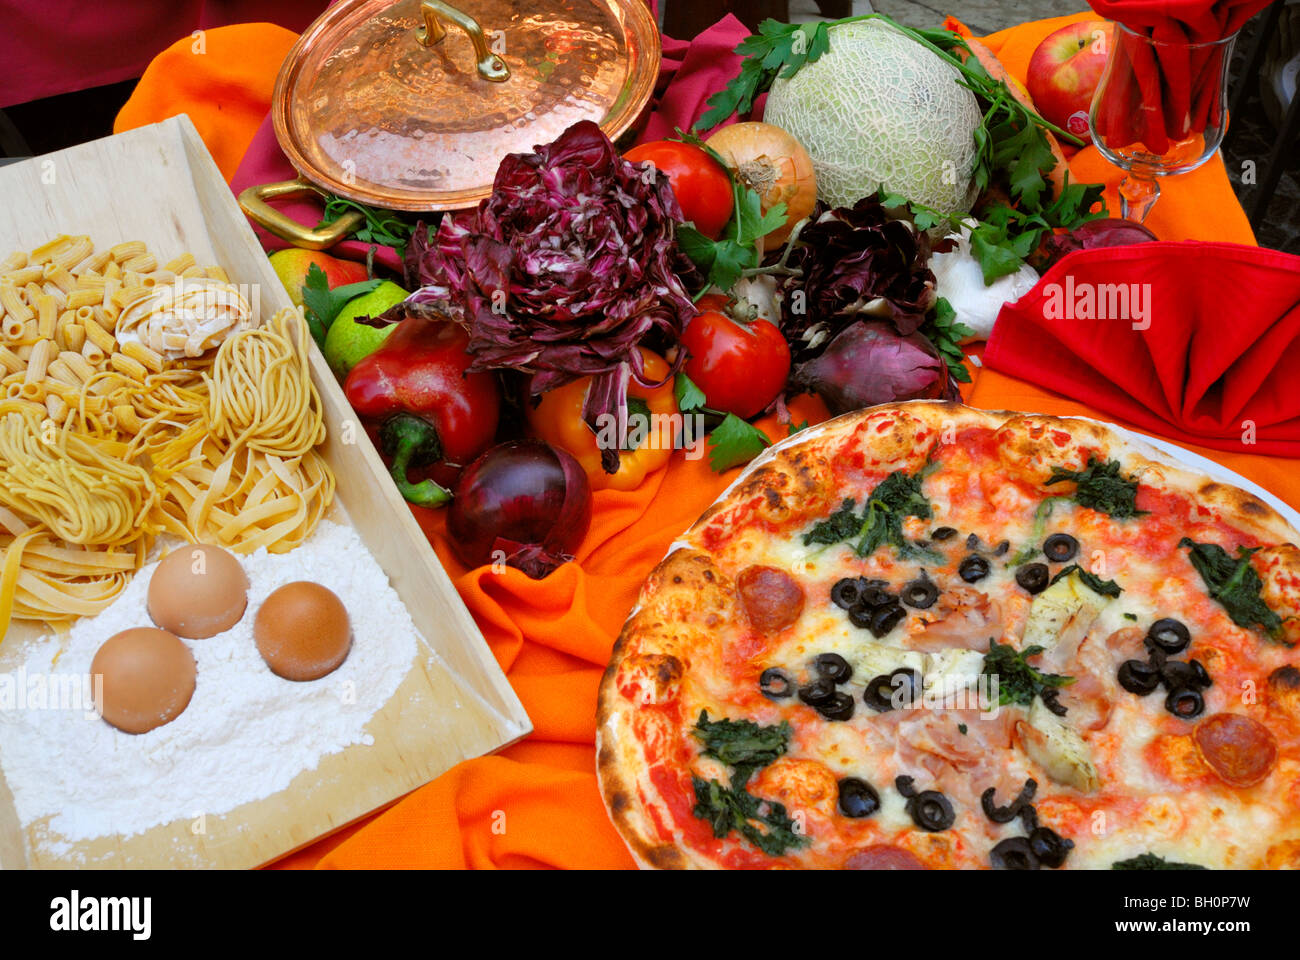 Italienische Küche, Malcesine, Veneto, Italien Stockbild